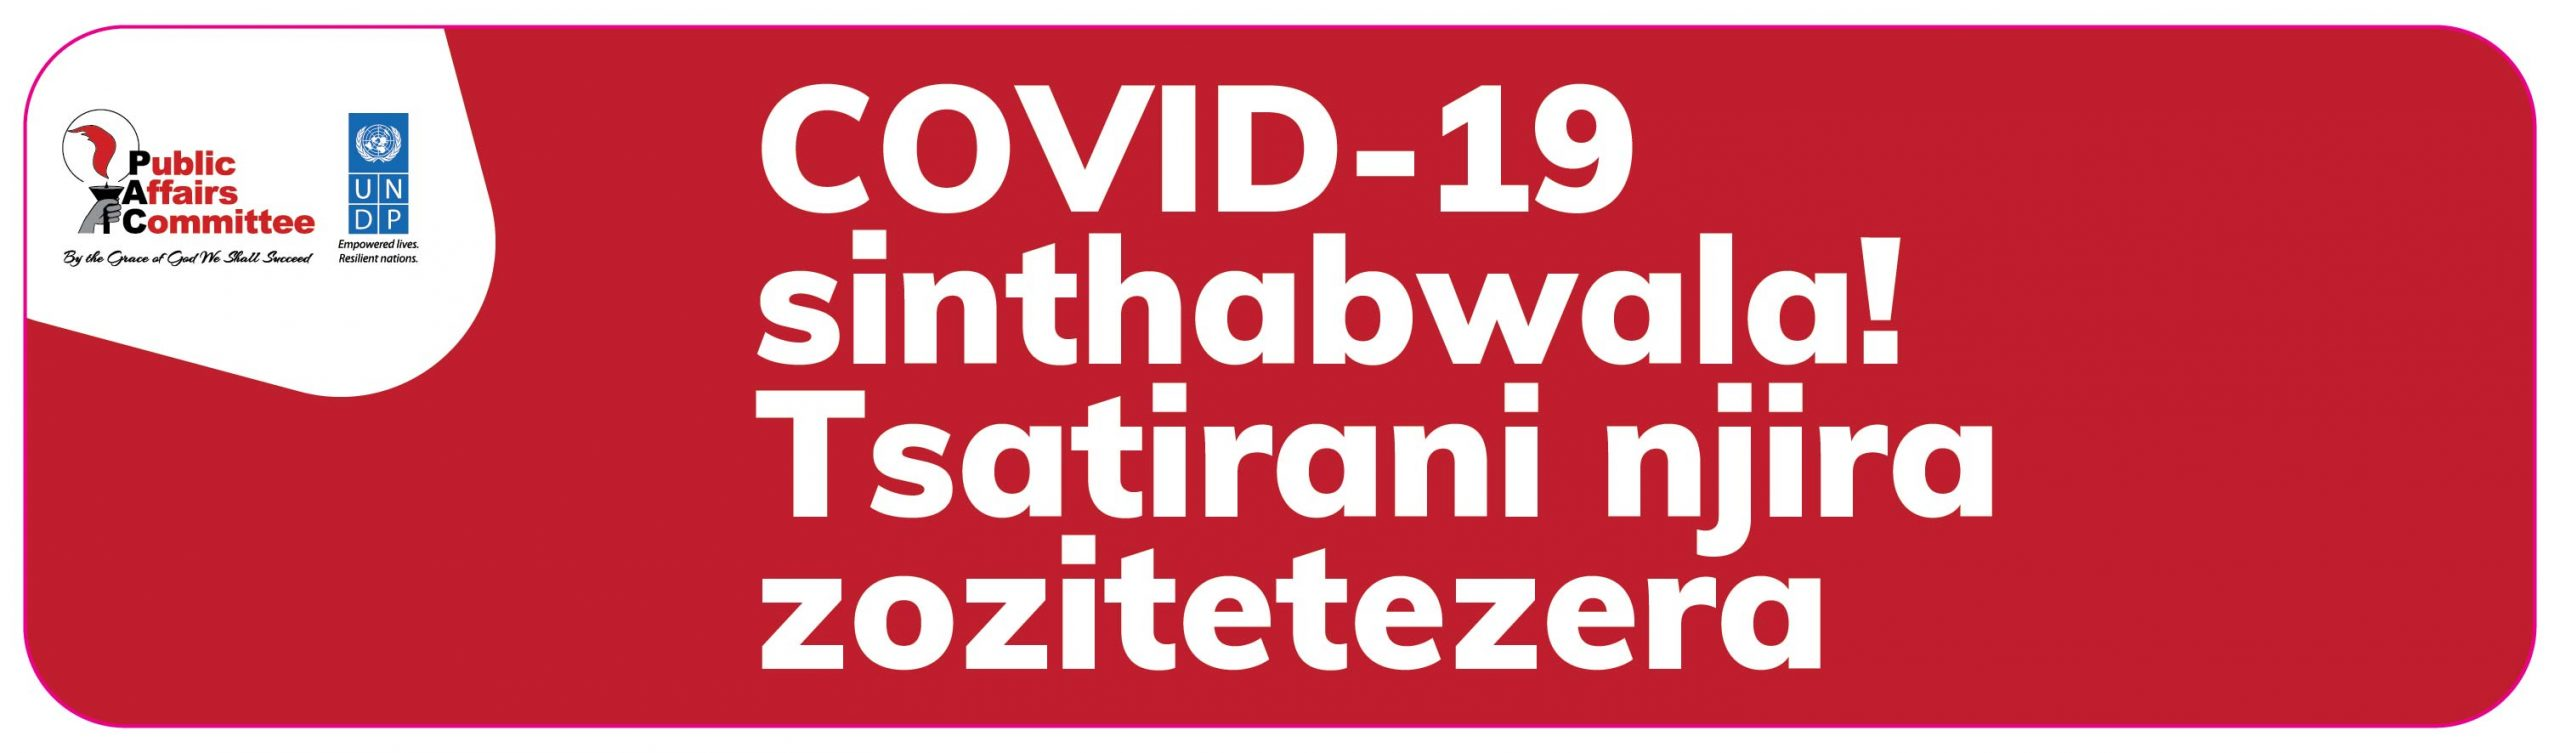 PAC stickers 25cm x 7cm chichewa--02